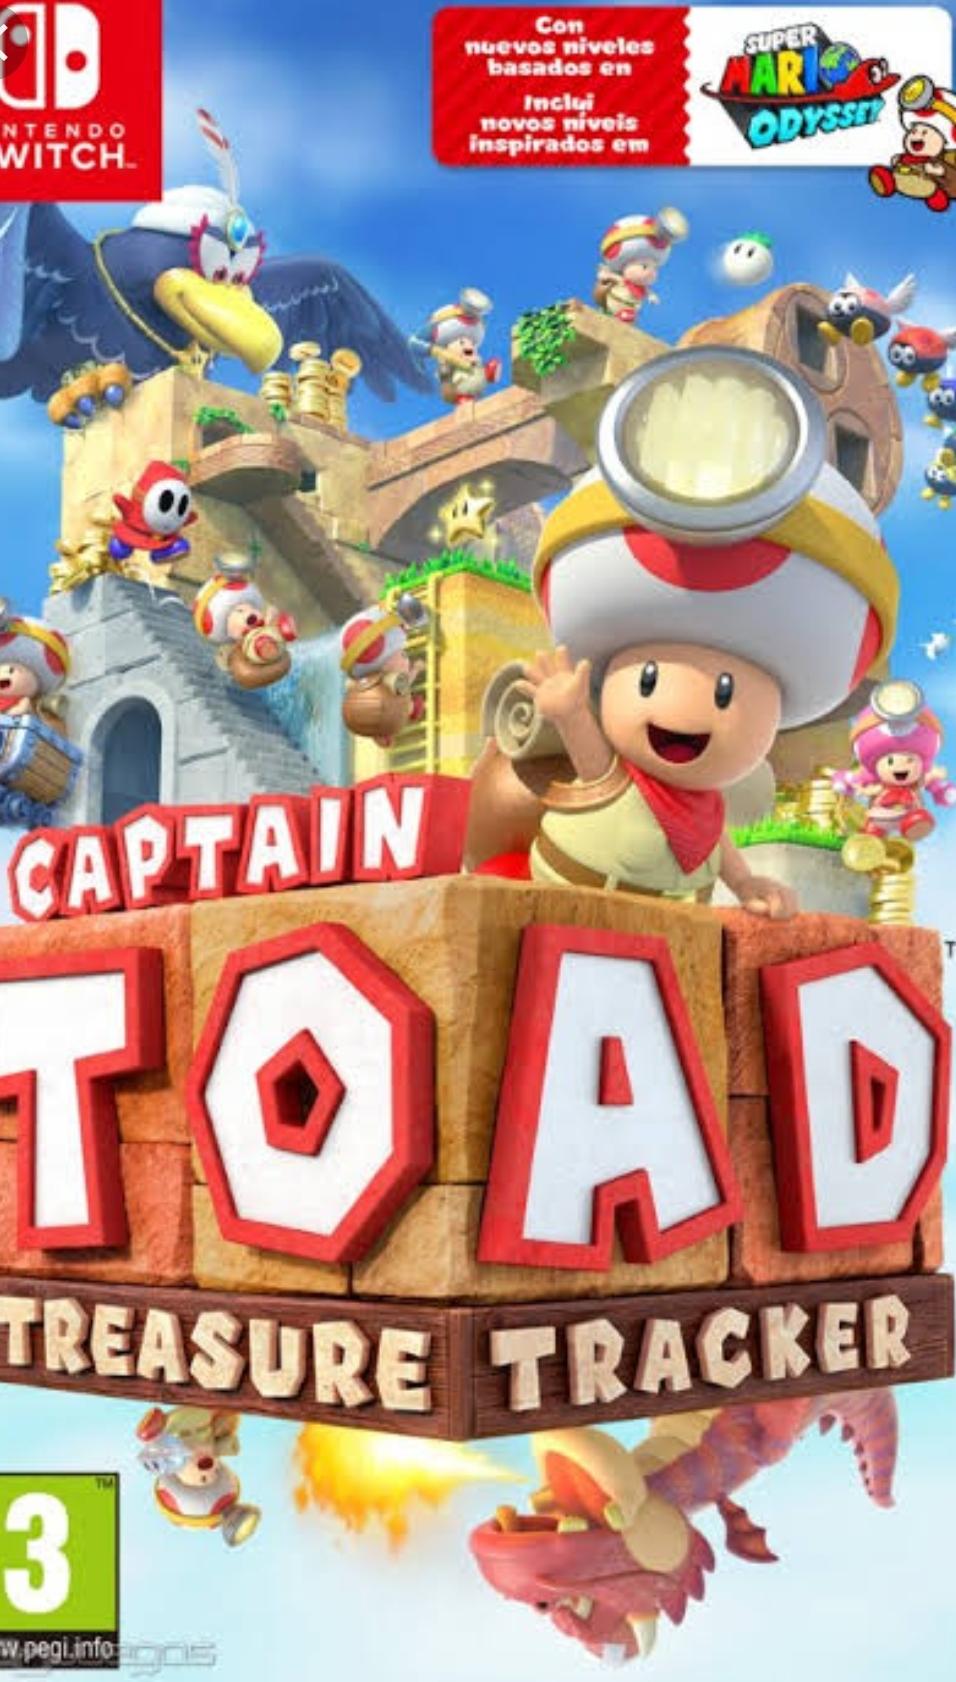 Nintendo: Capitan Toad para nintendo switch gratis 5-11Agosto